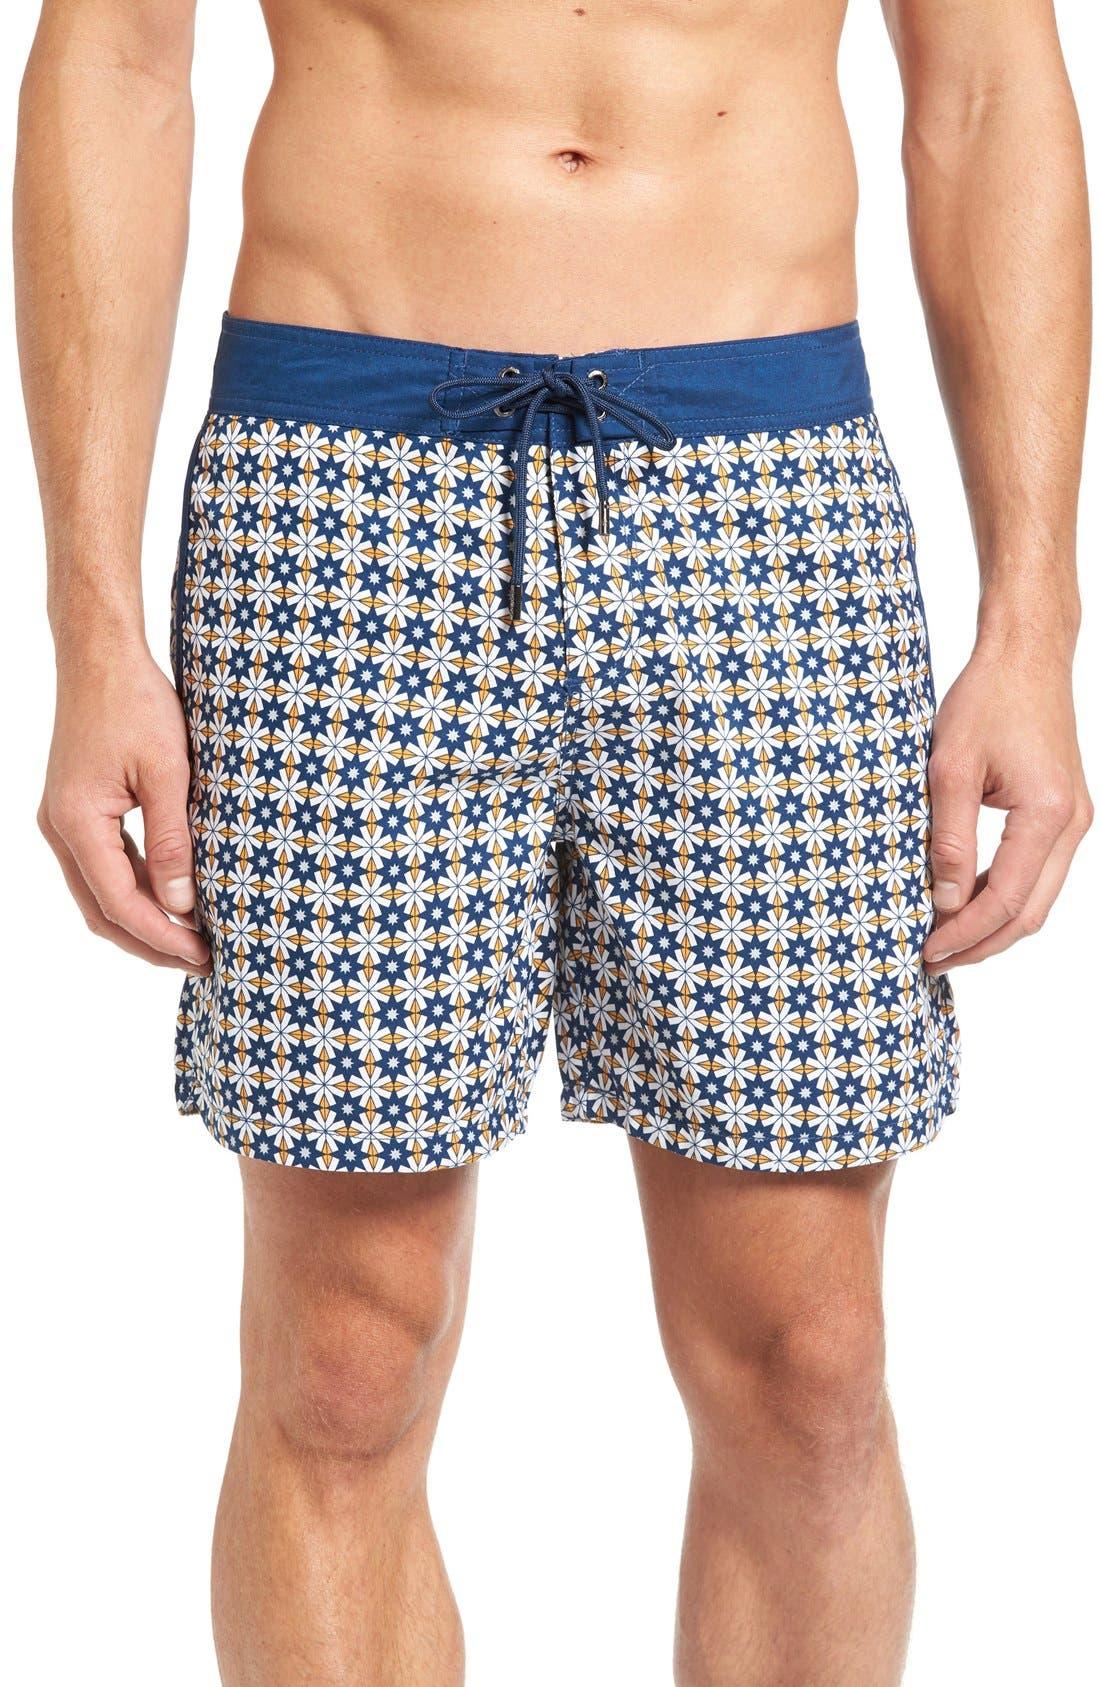 Mr.Swim Star Tile Print Board Shorts